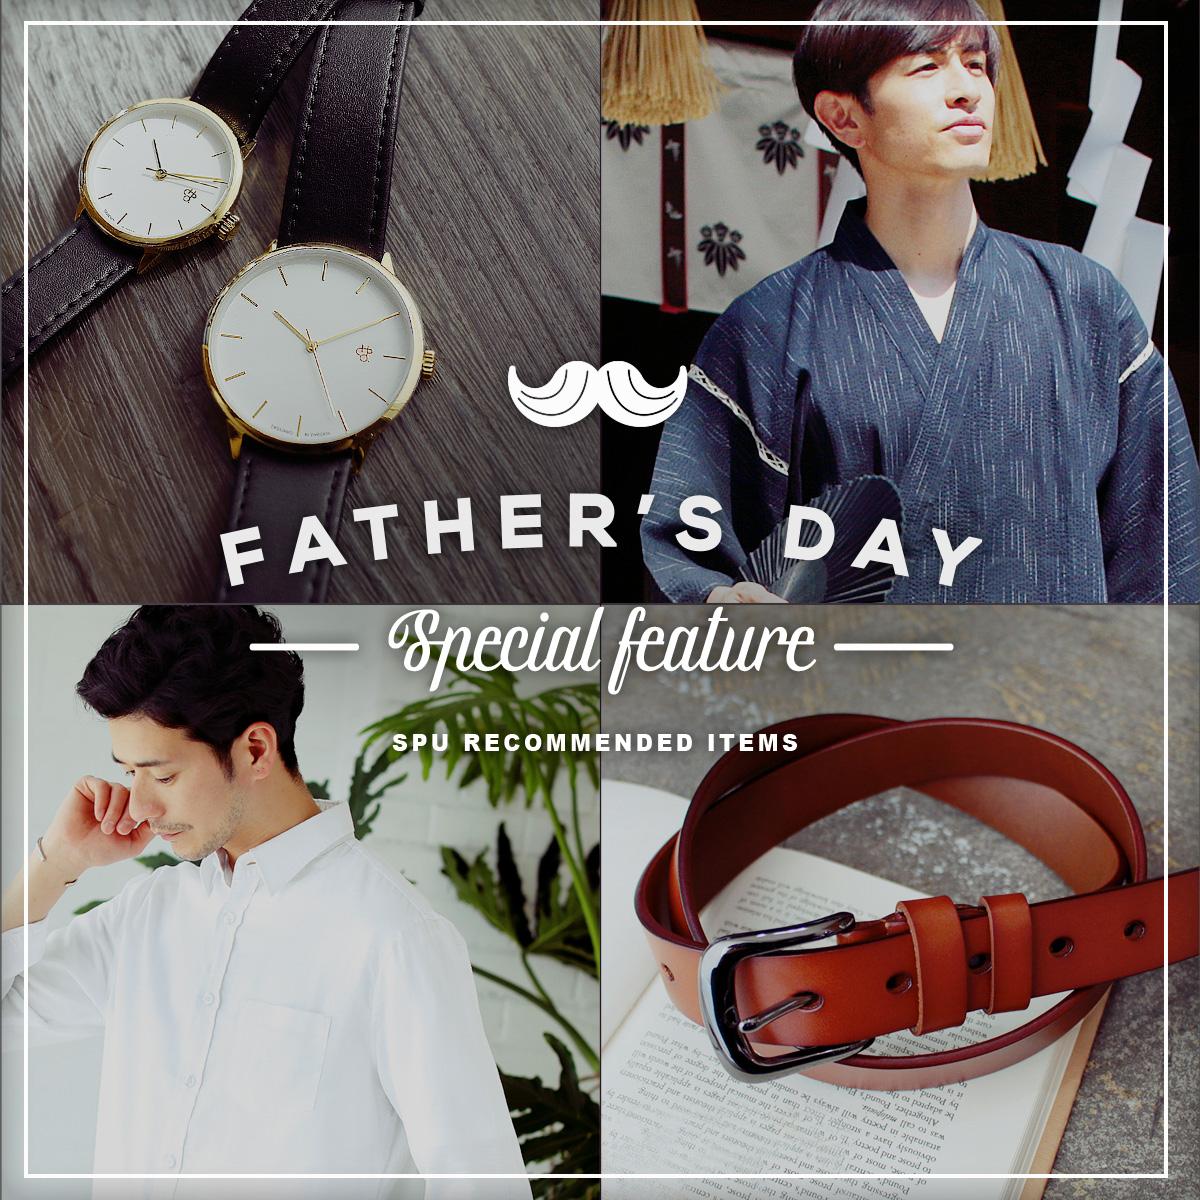 /icon/fathersday__icon.jpg